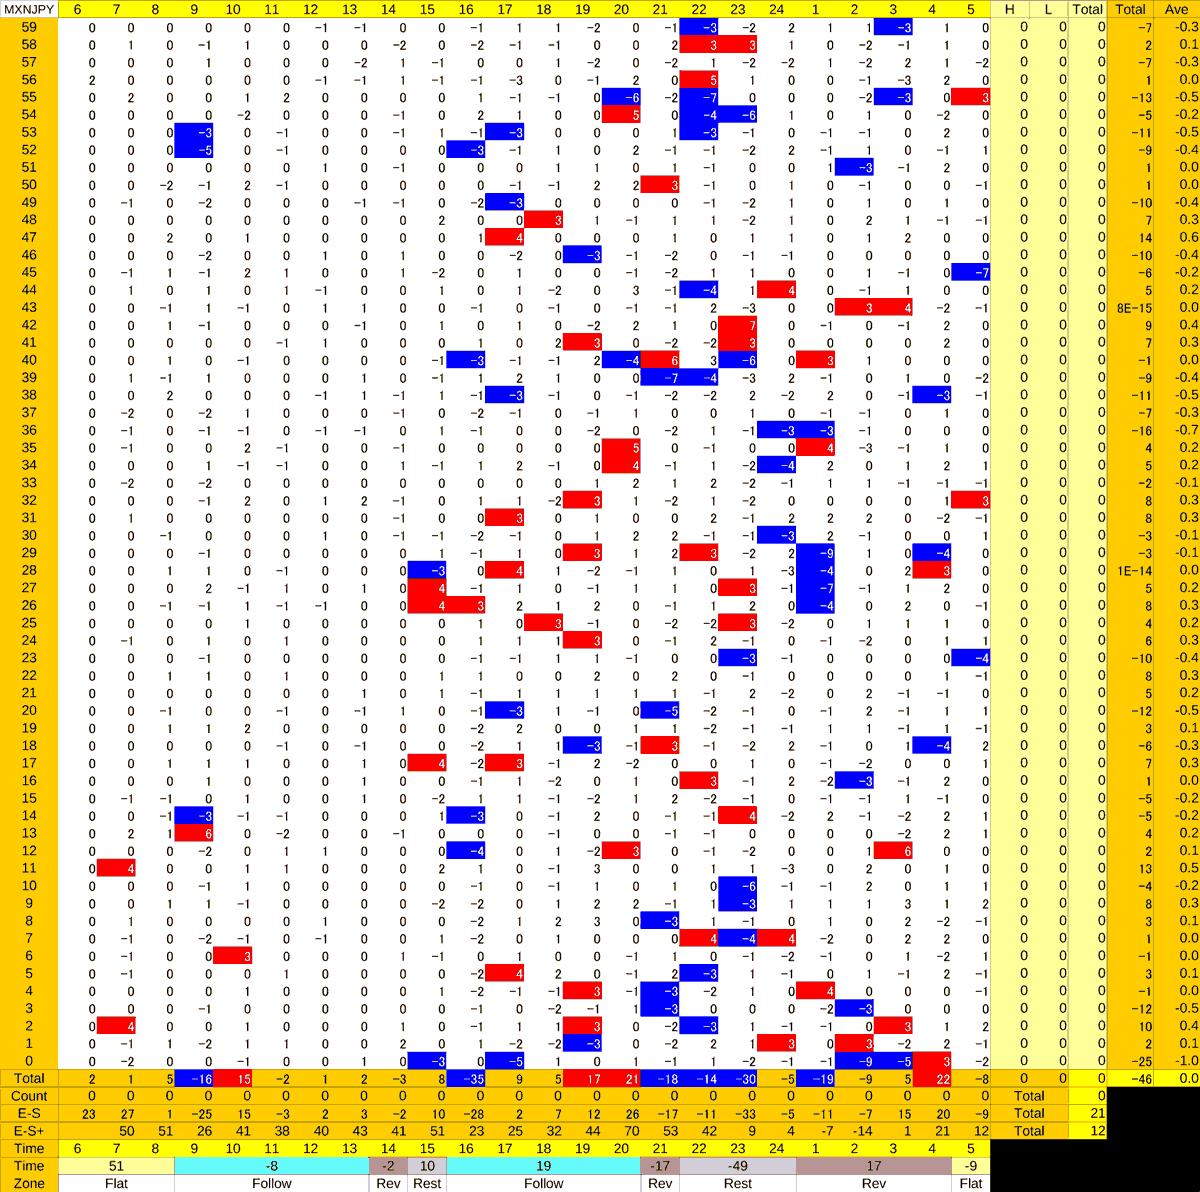 20200928_HS(3)MXNJPY